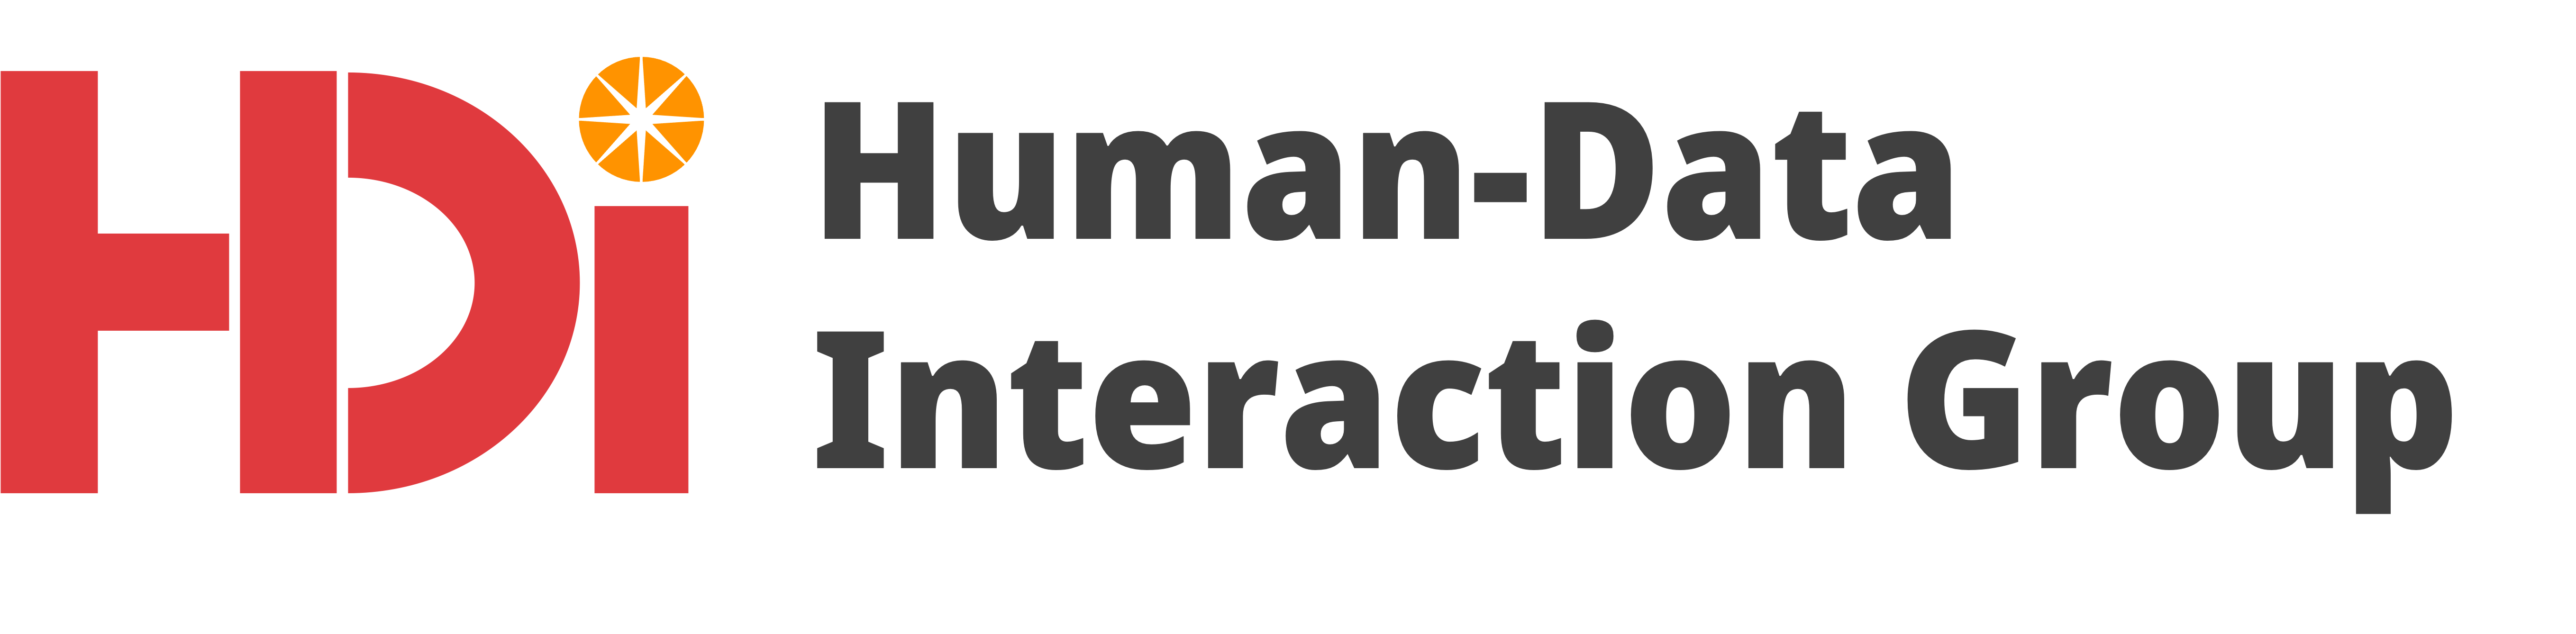 Human-Data Interaction Group